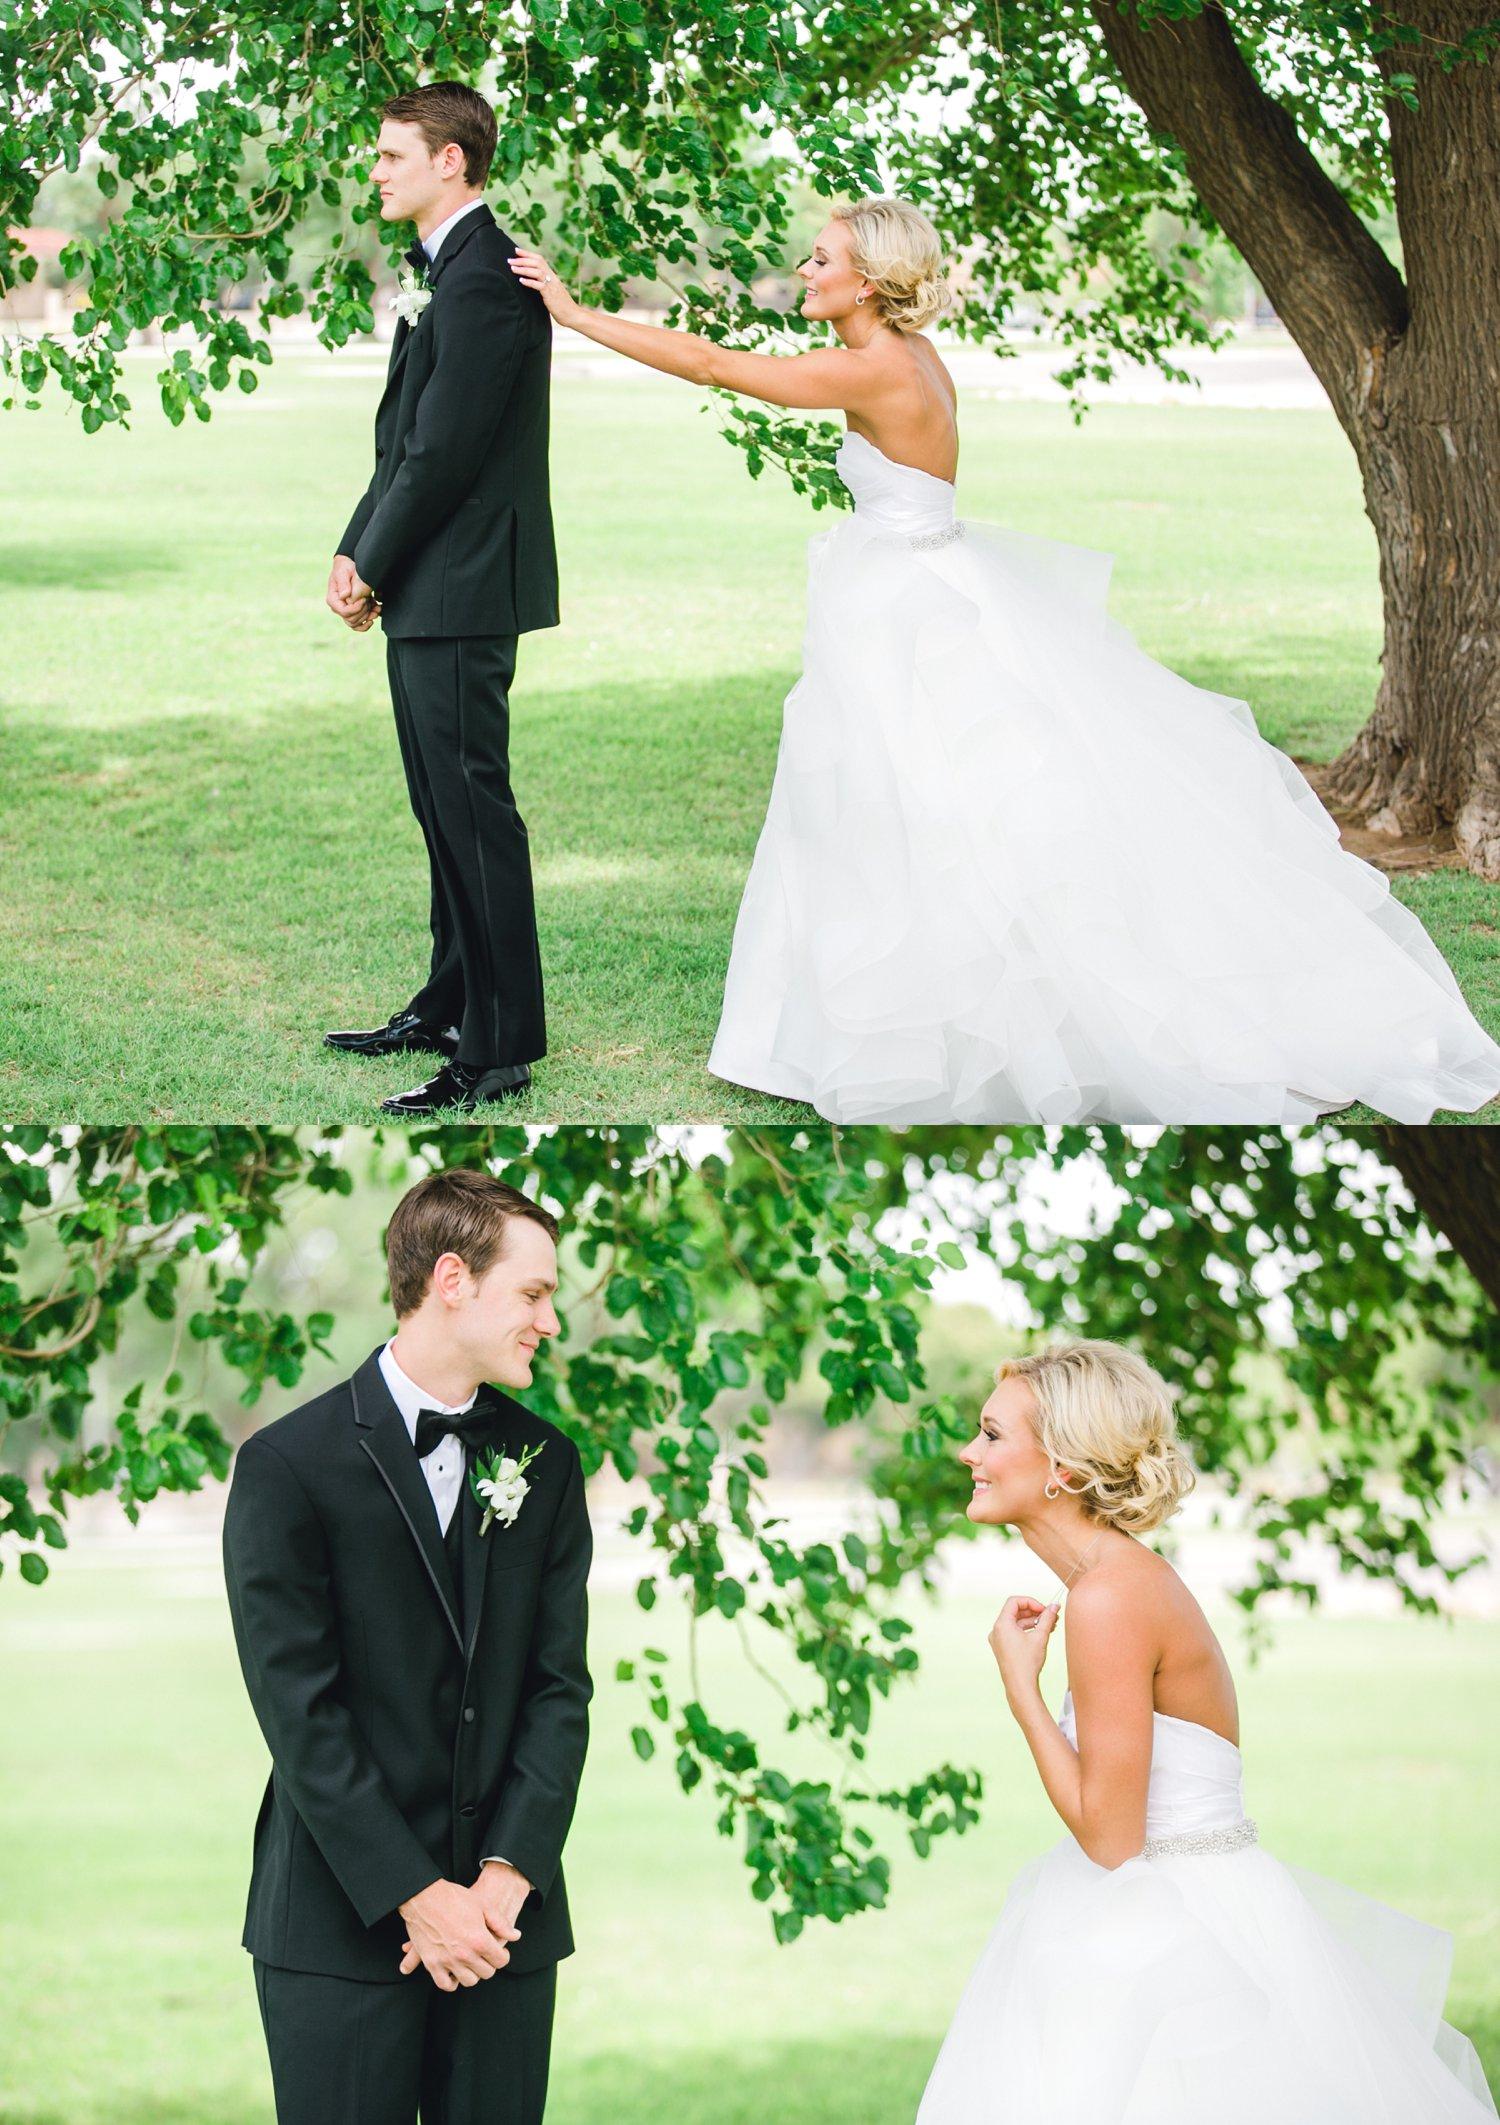 Taylor-and-Brock-Williams-Texas-Tech-University-Merket-Alumni-Center-Lubbock-Photographer-ALLEEJ0041.jpg